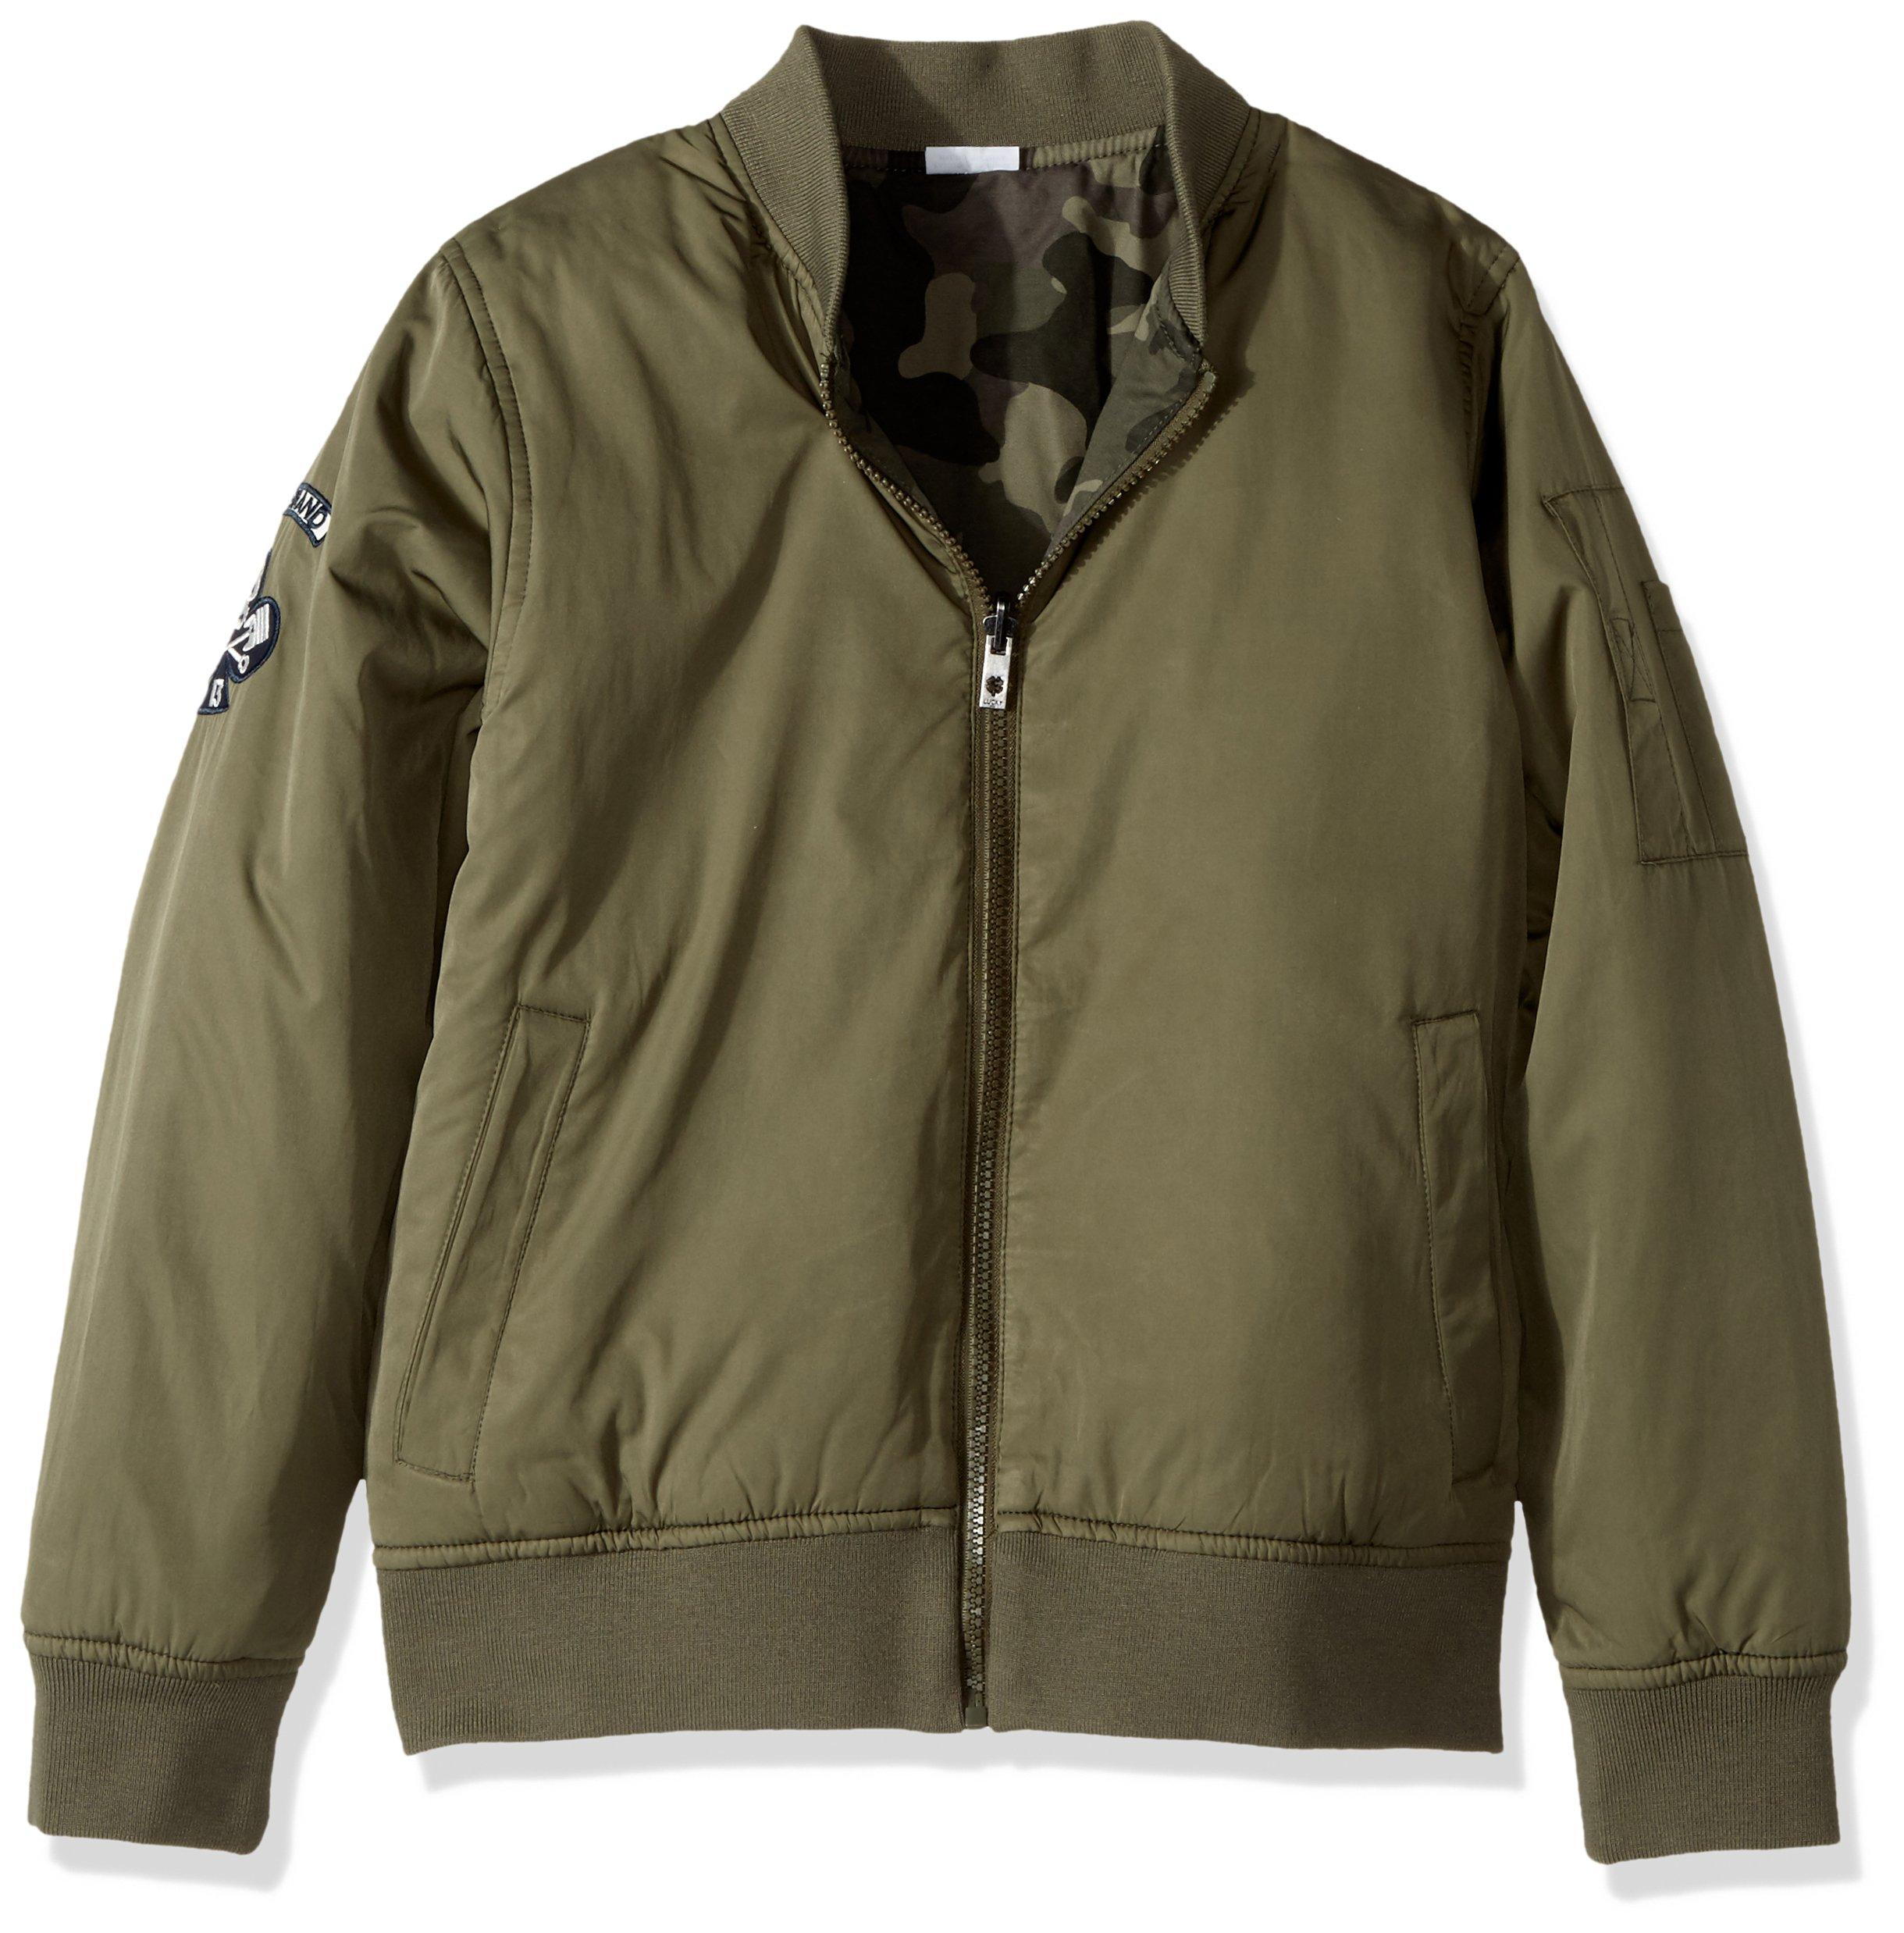 Lucky Brand Big Boys' Bomber Reversible Jacket, Dusty Olive, X-Large (18/20)